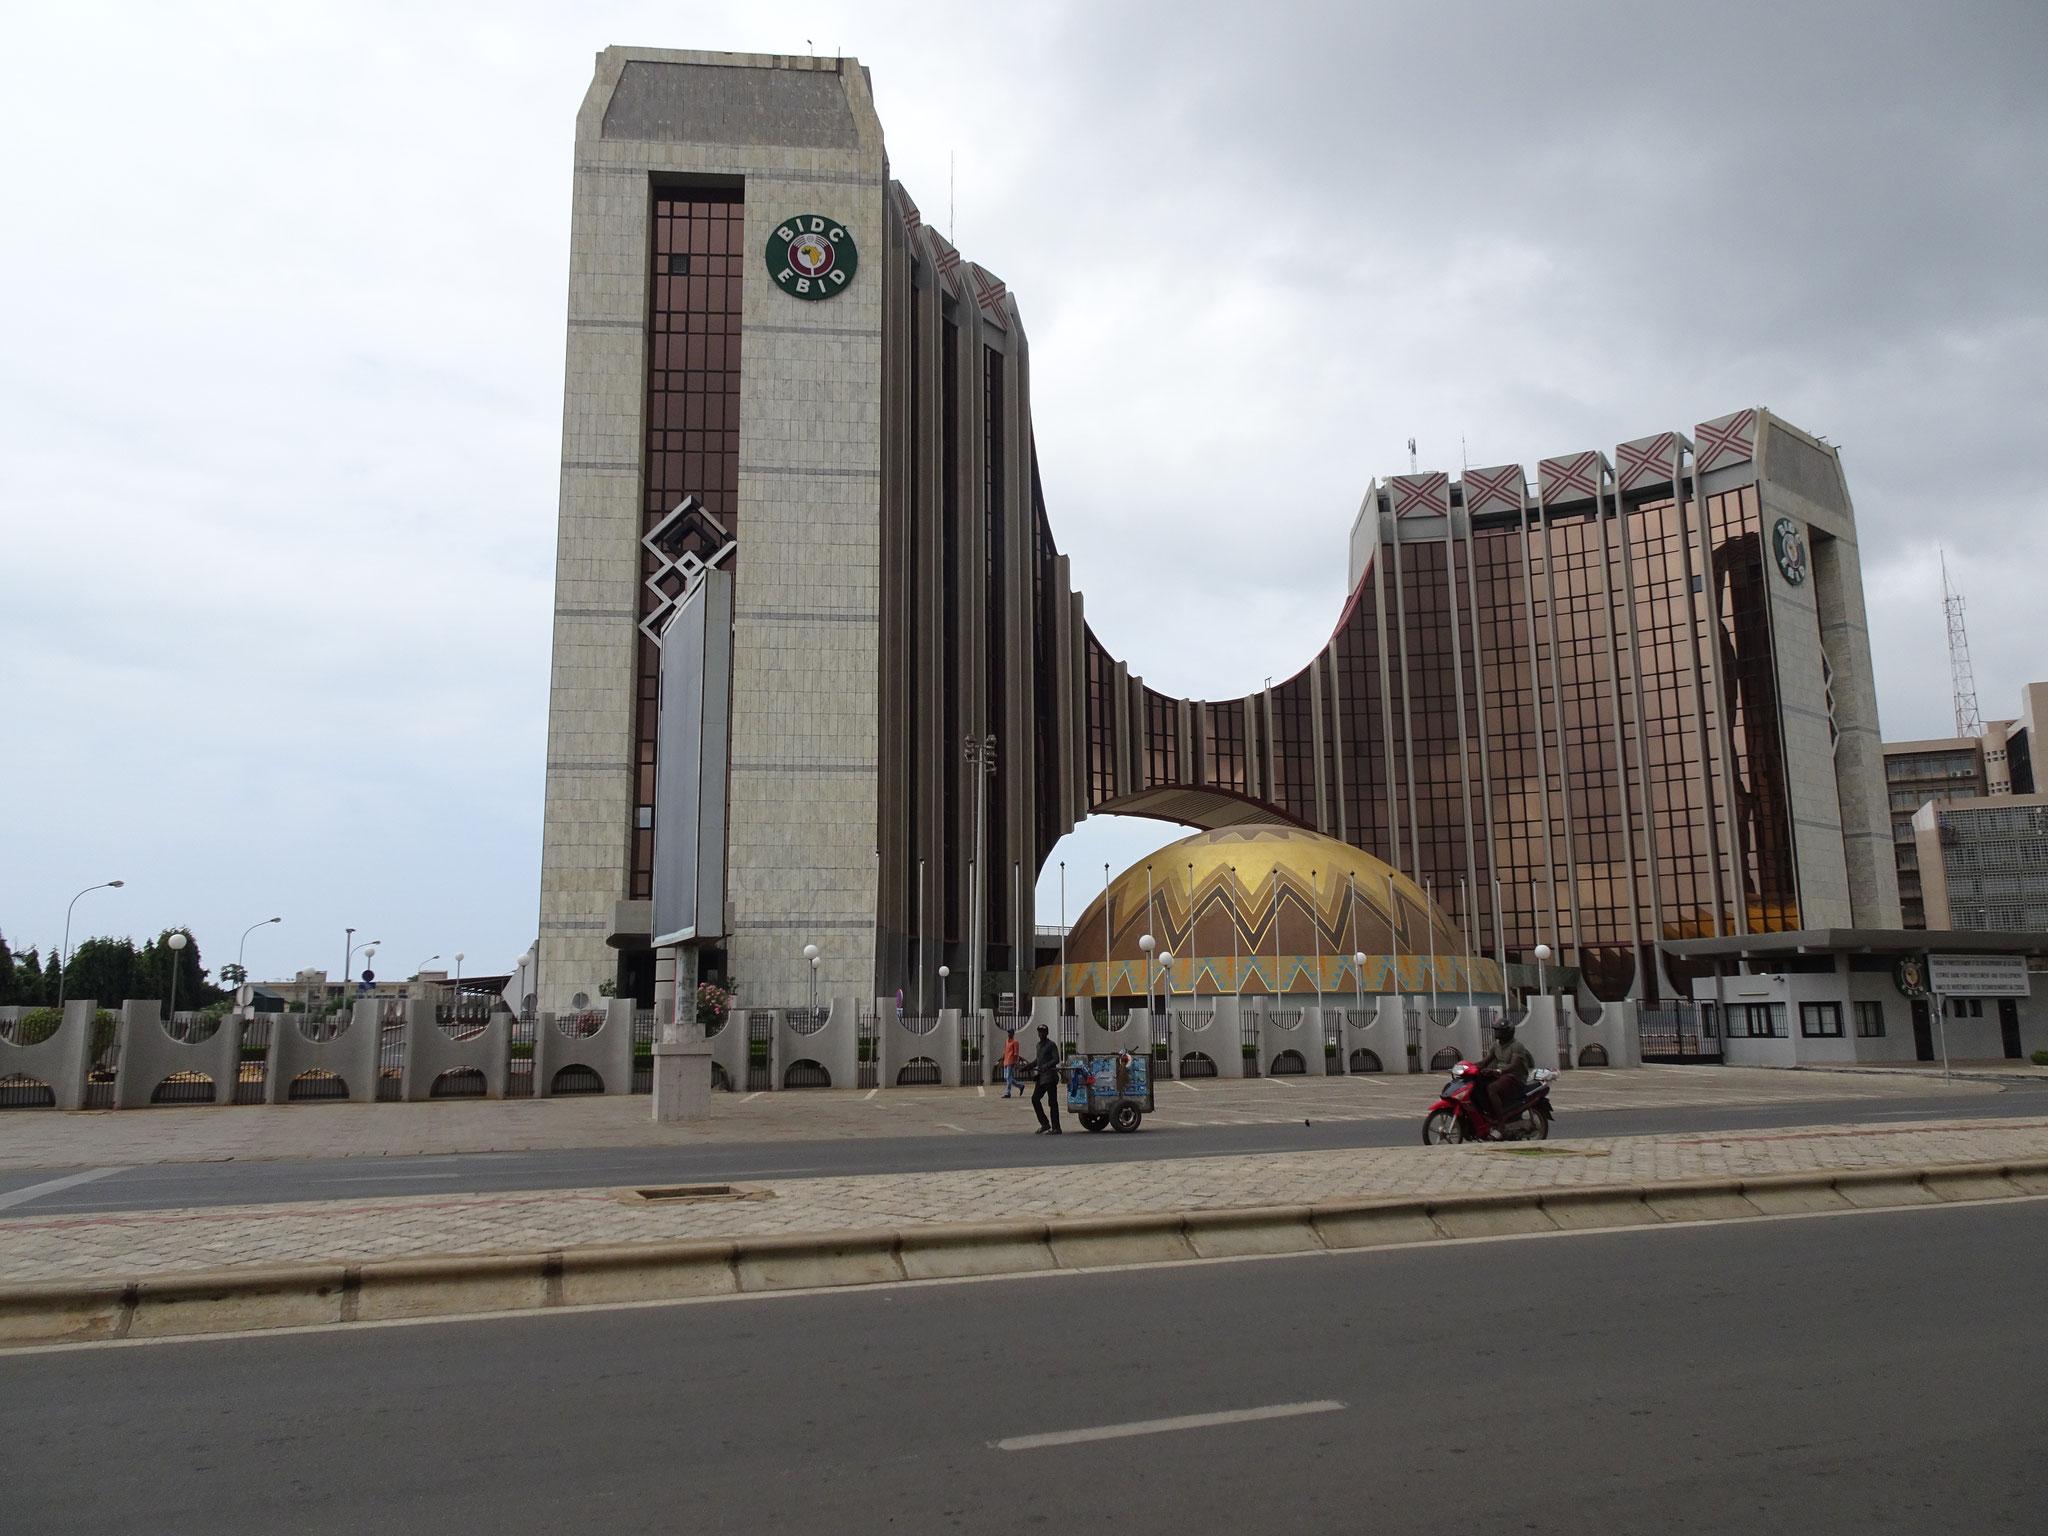 25. Gebäude in Doualasseme.